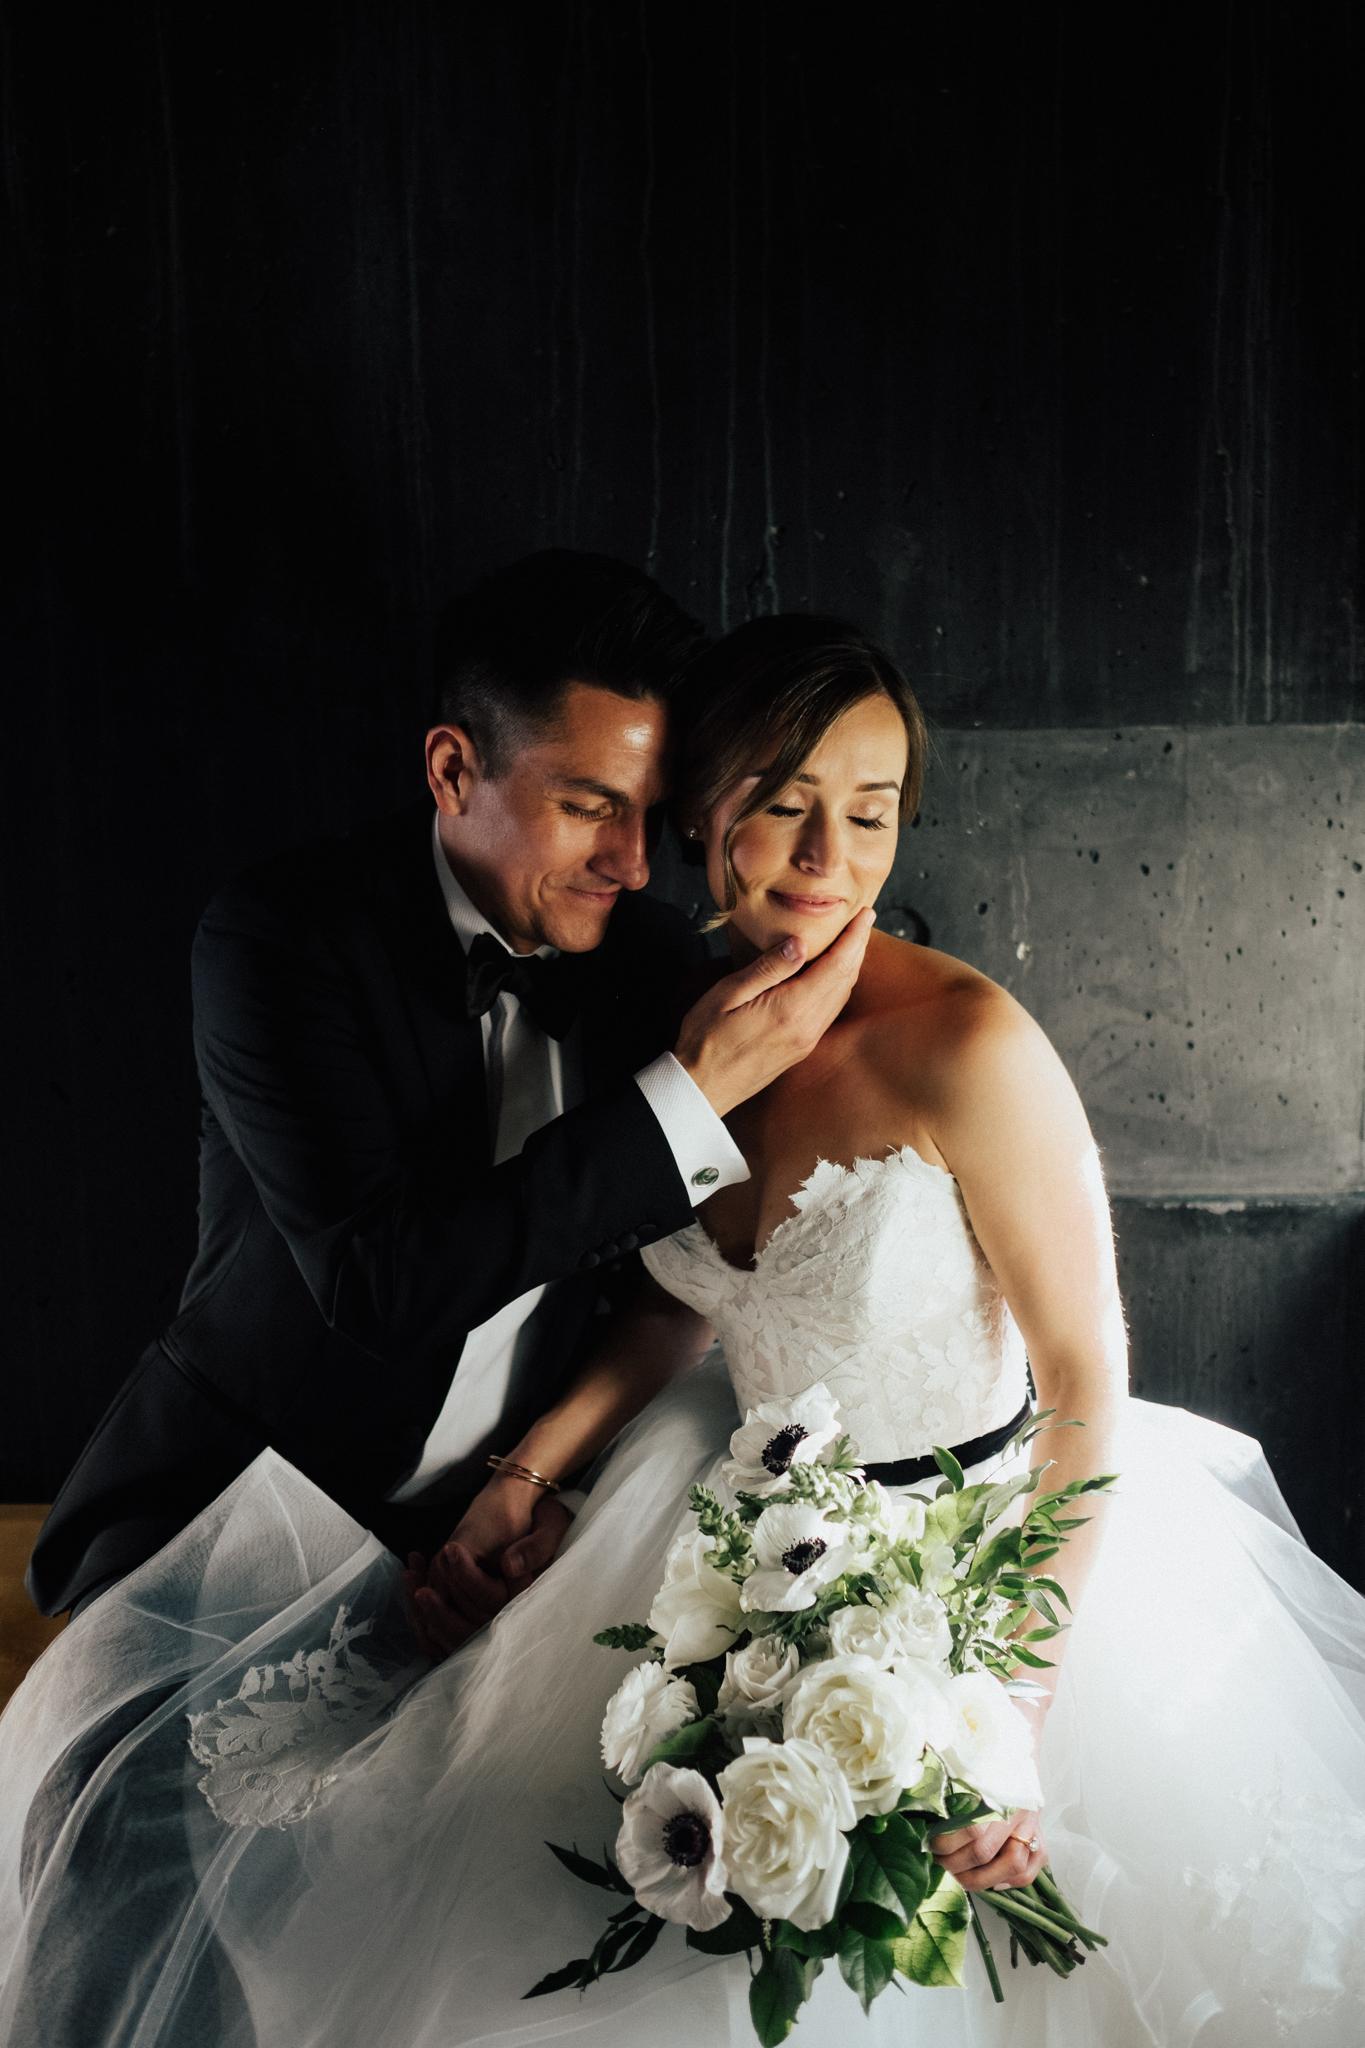 Arizona-Adventure-Elopement-Wedding-Photographer-18.jpg